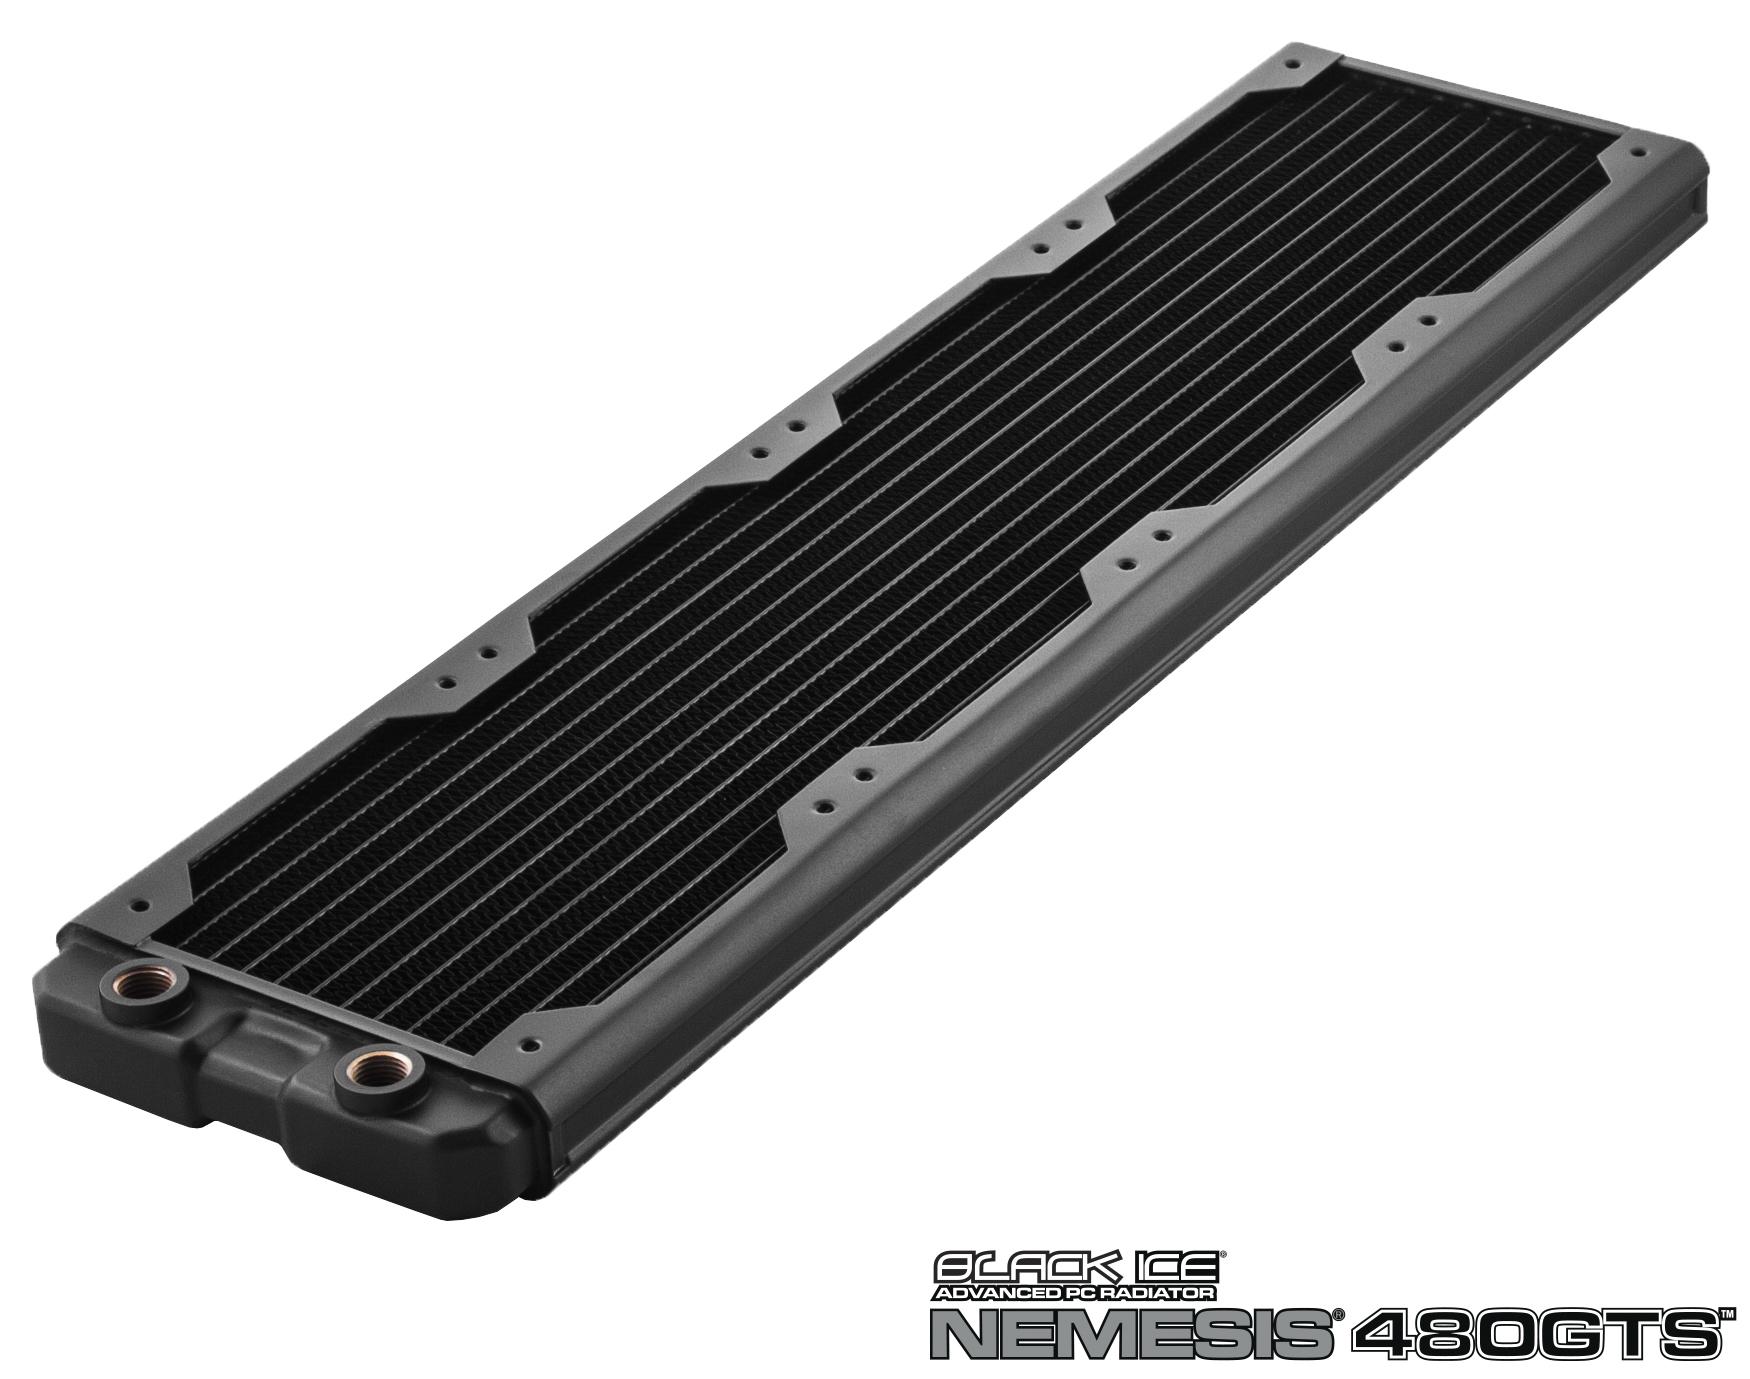 Hardware Labs - Black Ice Nemesis Radiator GTS 480 - Black